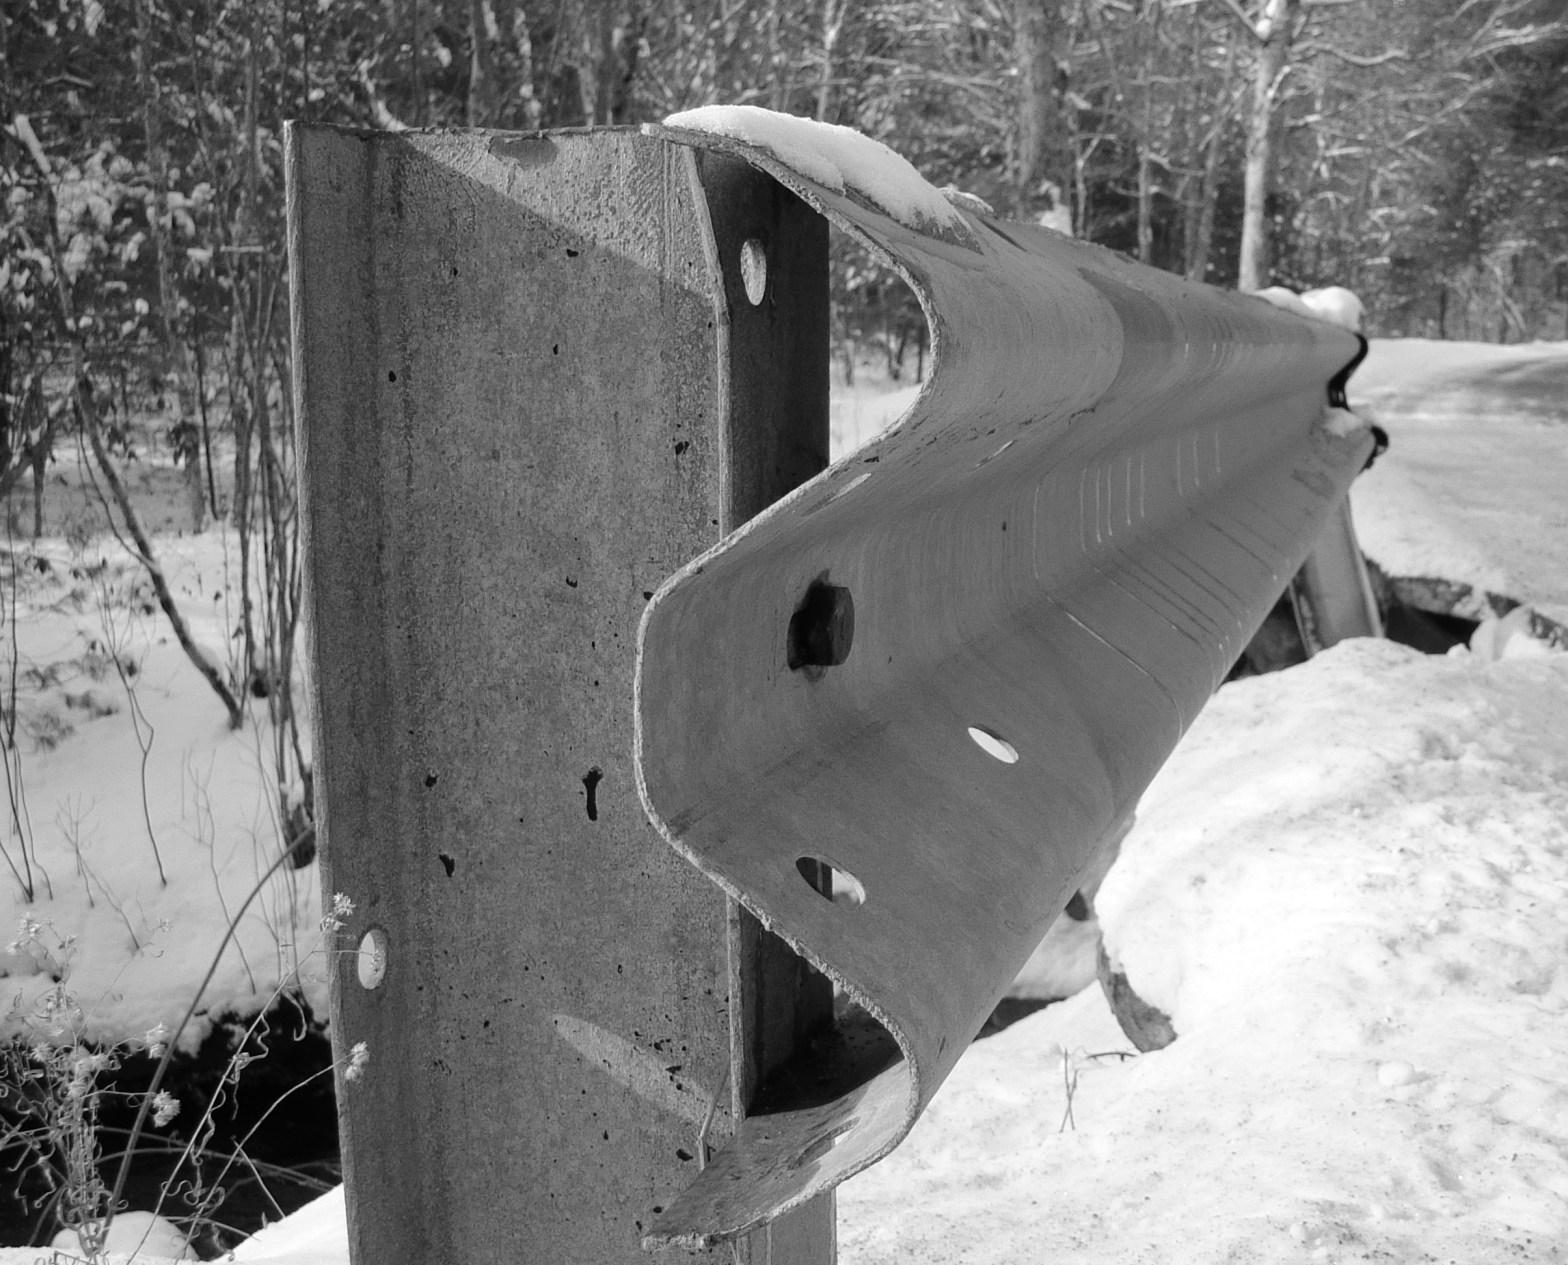 Mount Tom Trail in RI